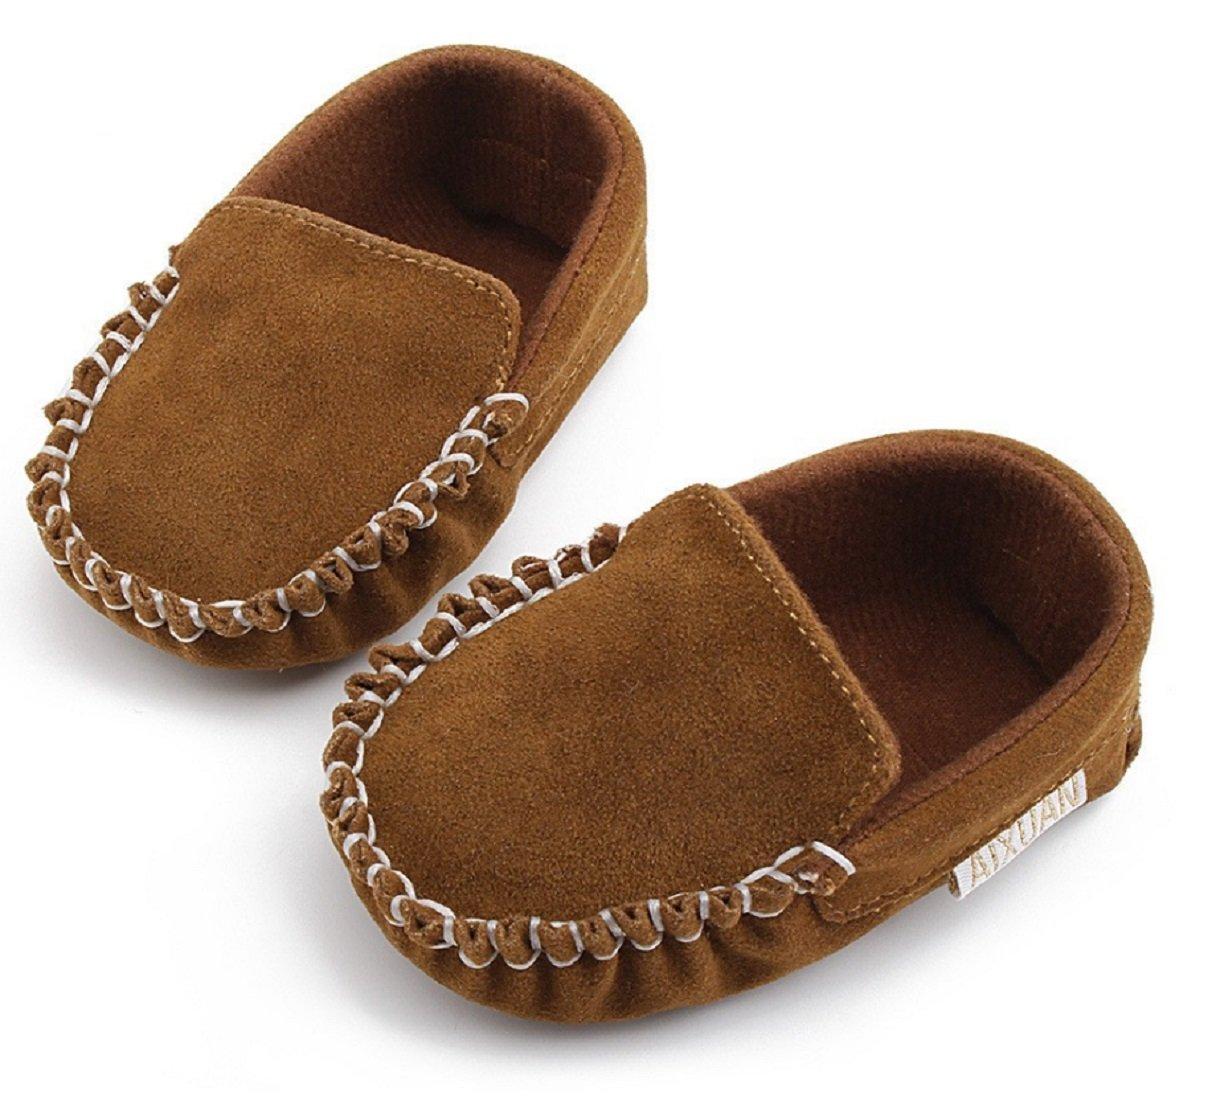 Infant leather Moccasins kids leather shoes boys girls moccs